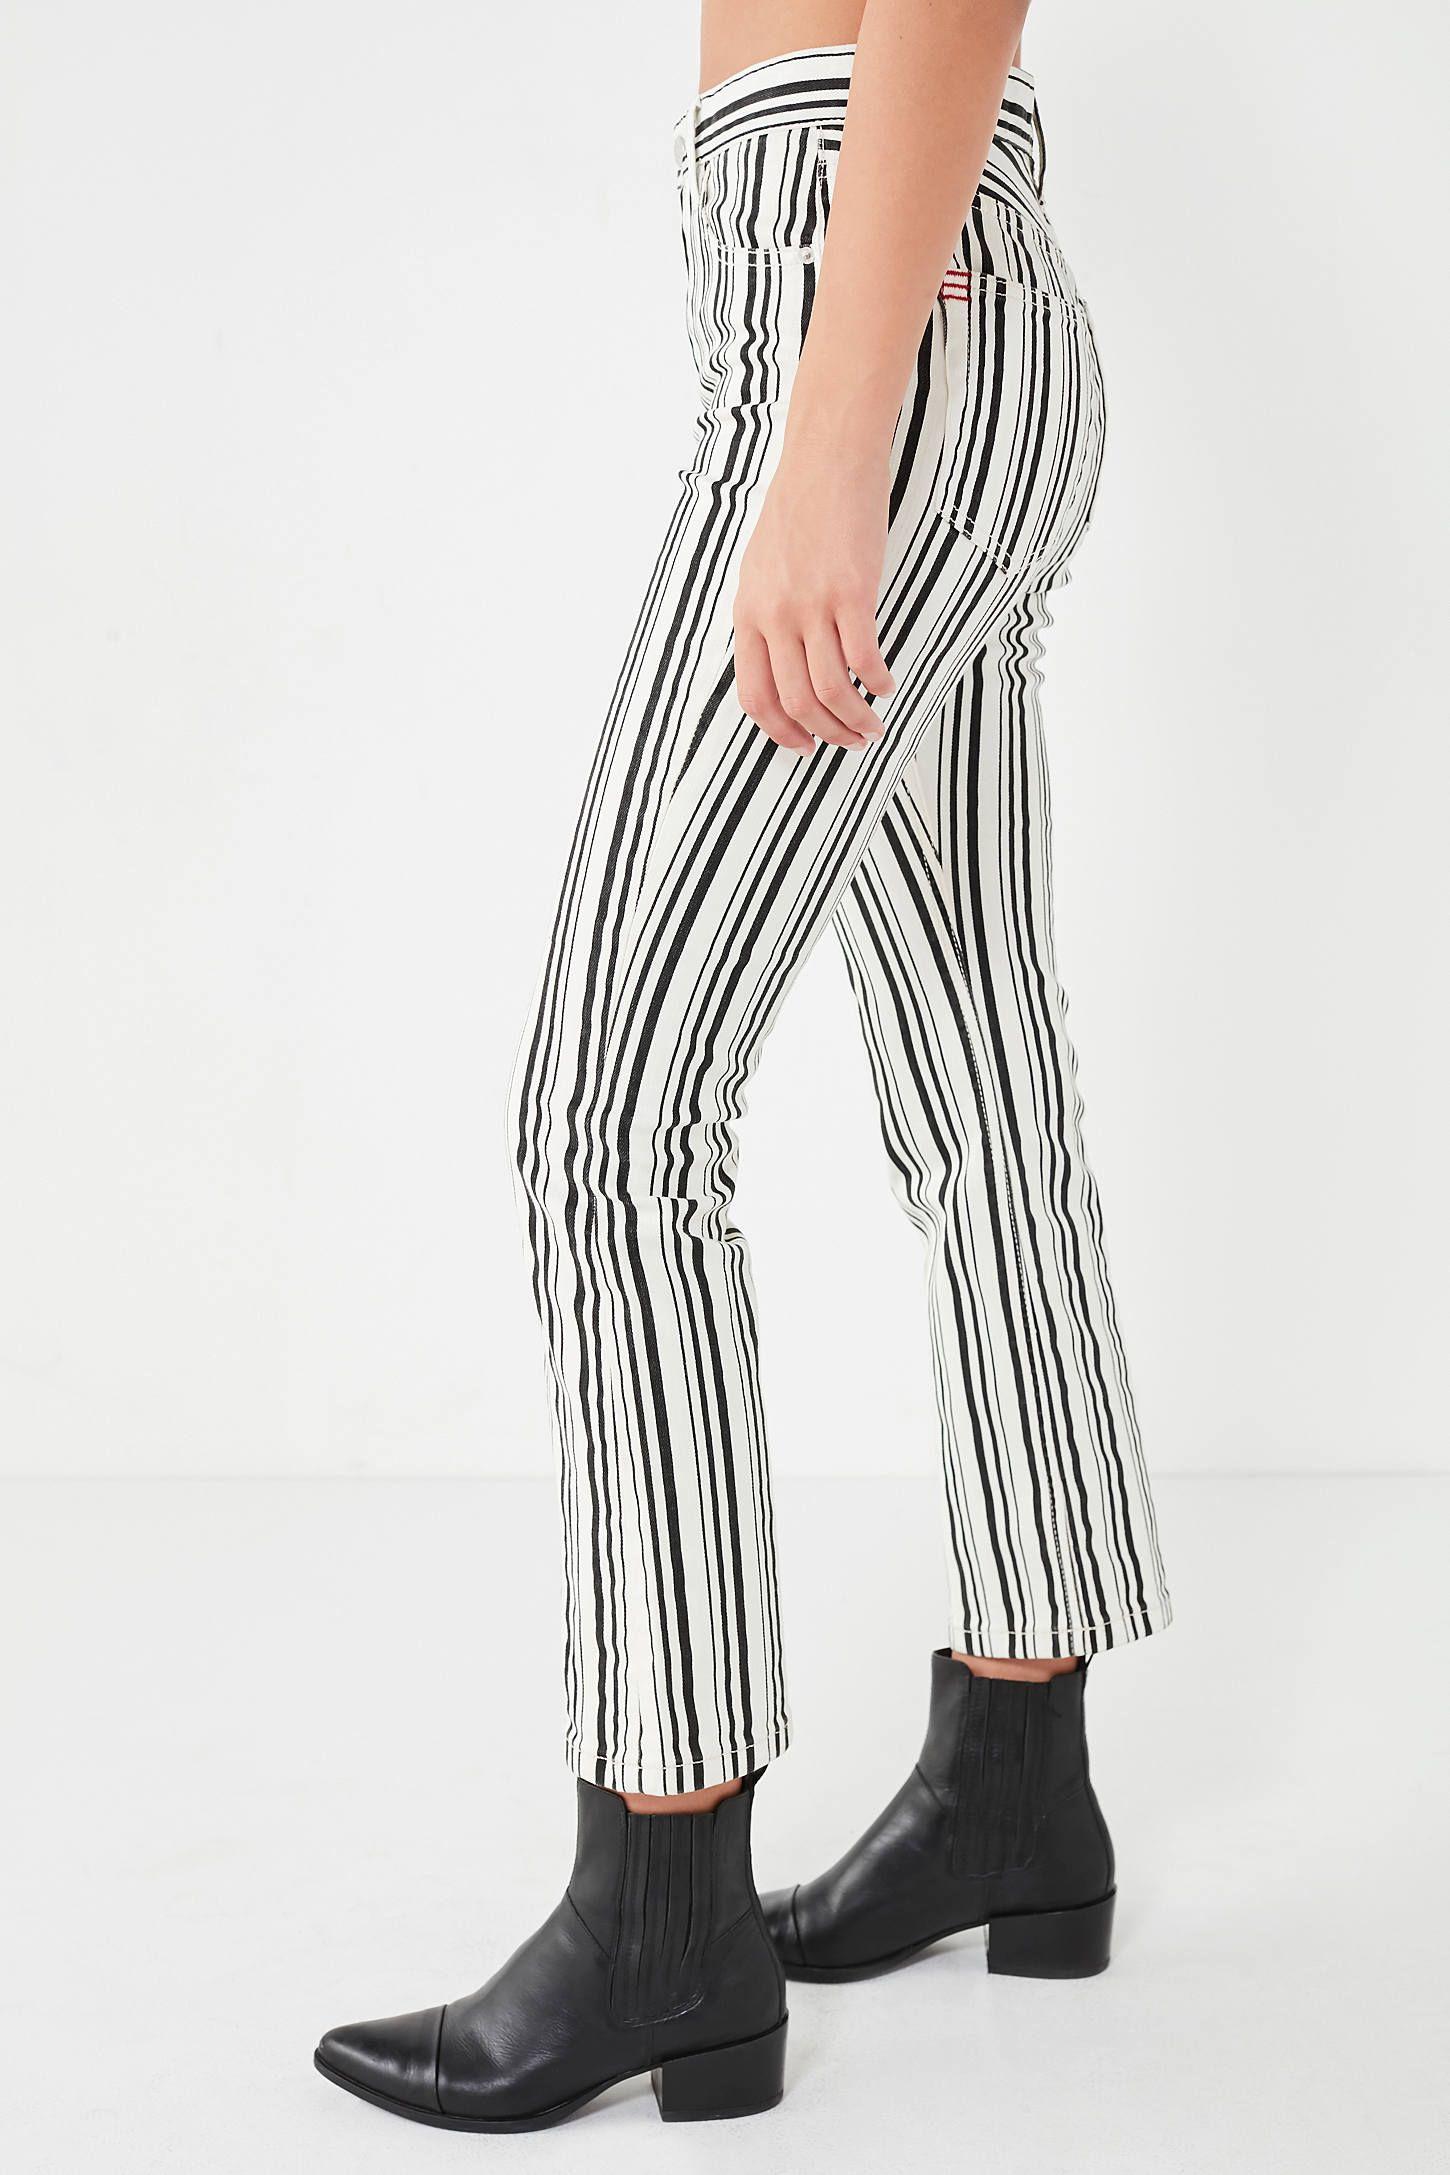 b7779b843591c BDG High-Rise Cropped Kick Flare Jean – Stripe in 2019